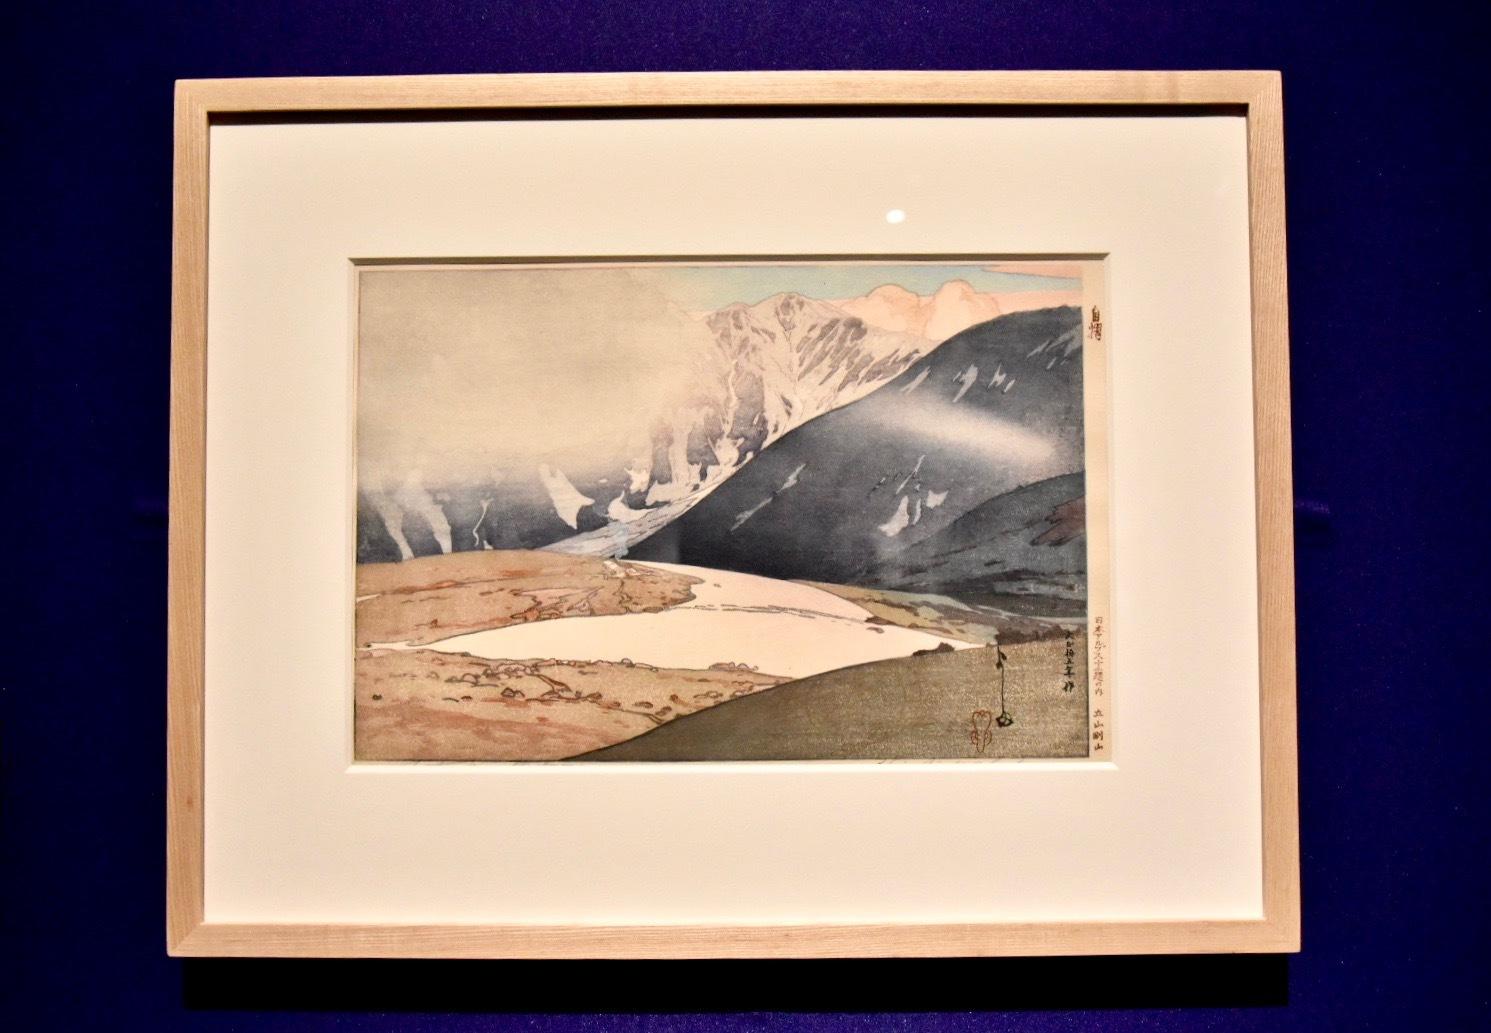 《日本アルプス十二題 立山別山》1926年(前期展示:1月26日〜2月28日)